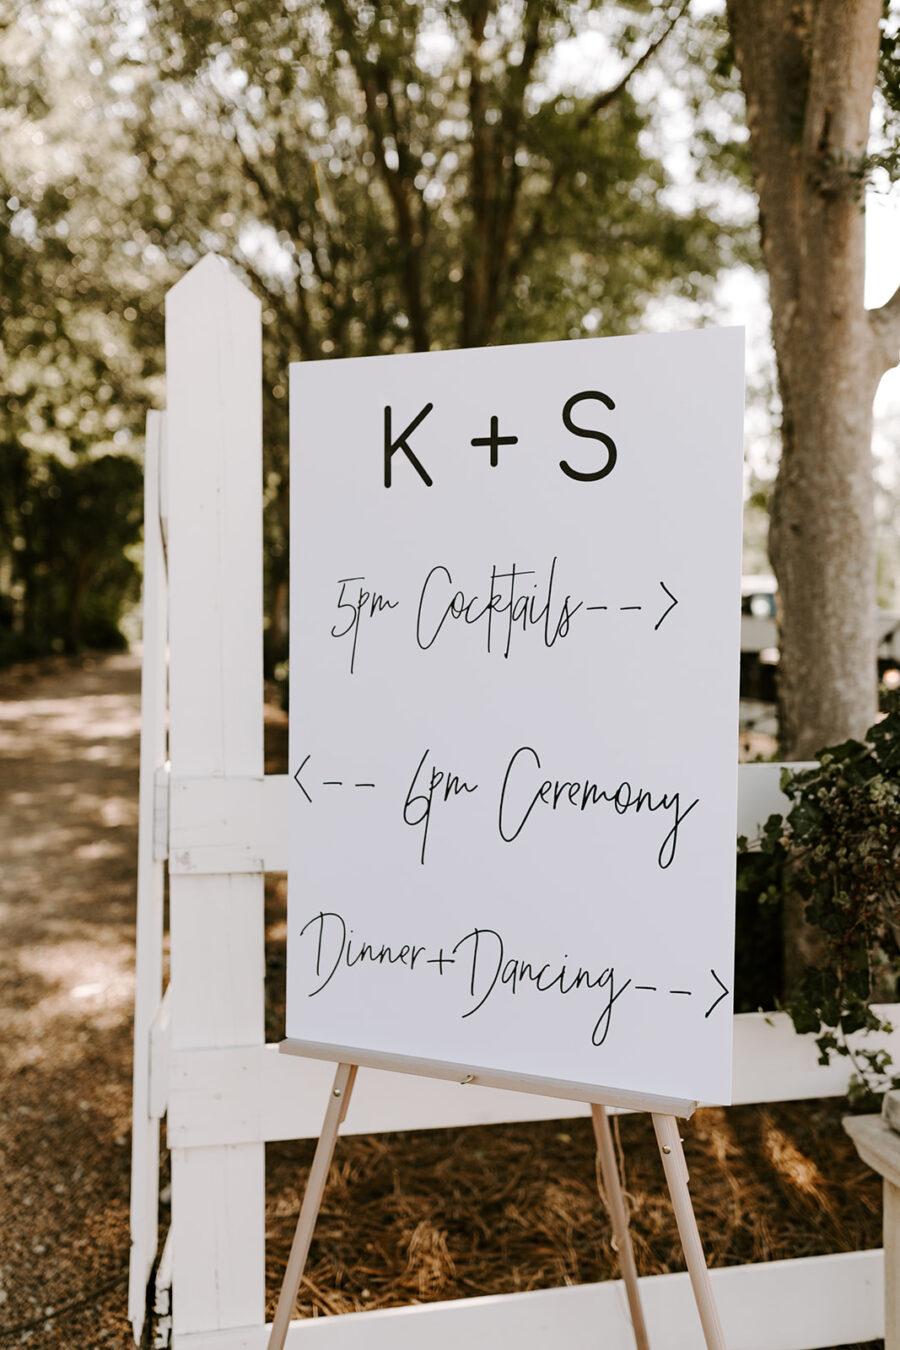 Black and white wedding program sign